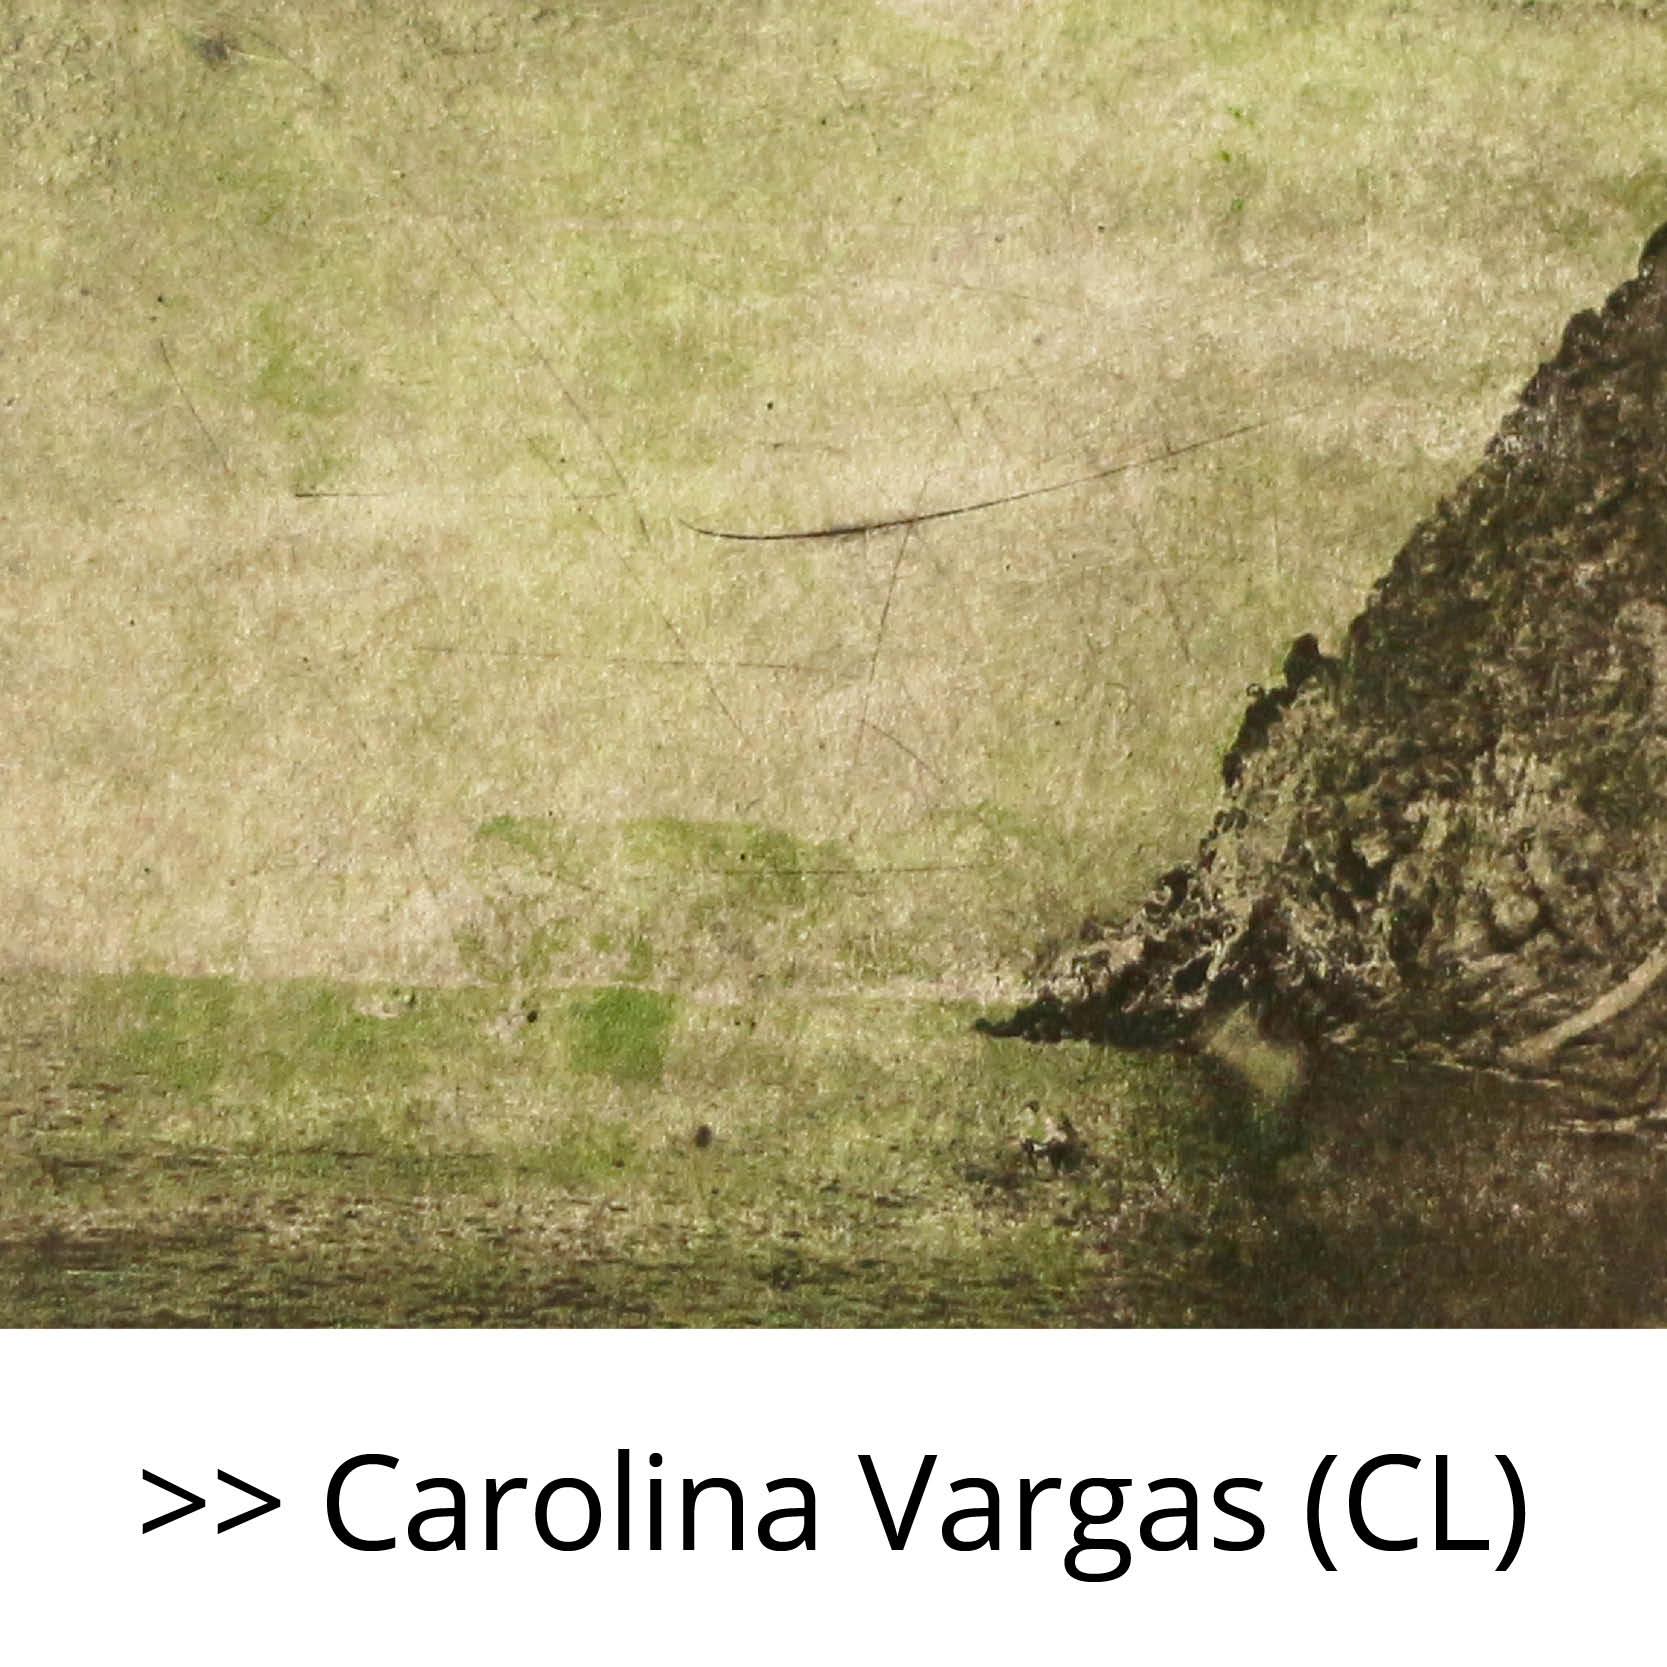 Carolina_Vargas_(CL)